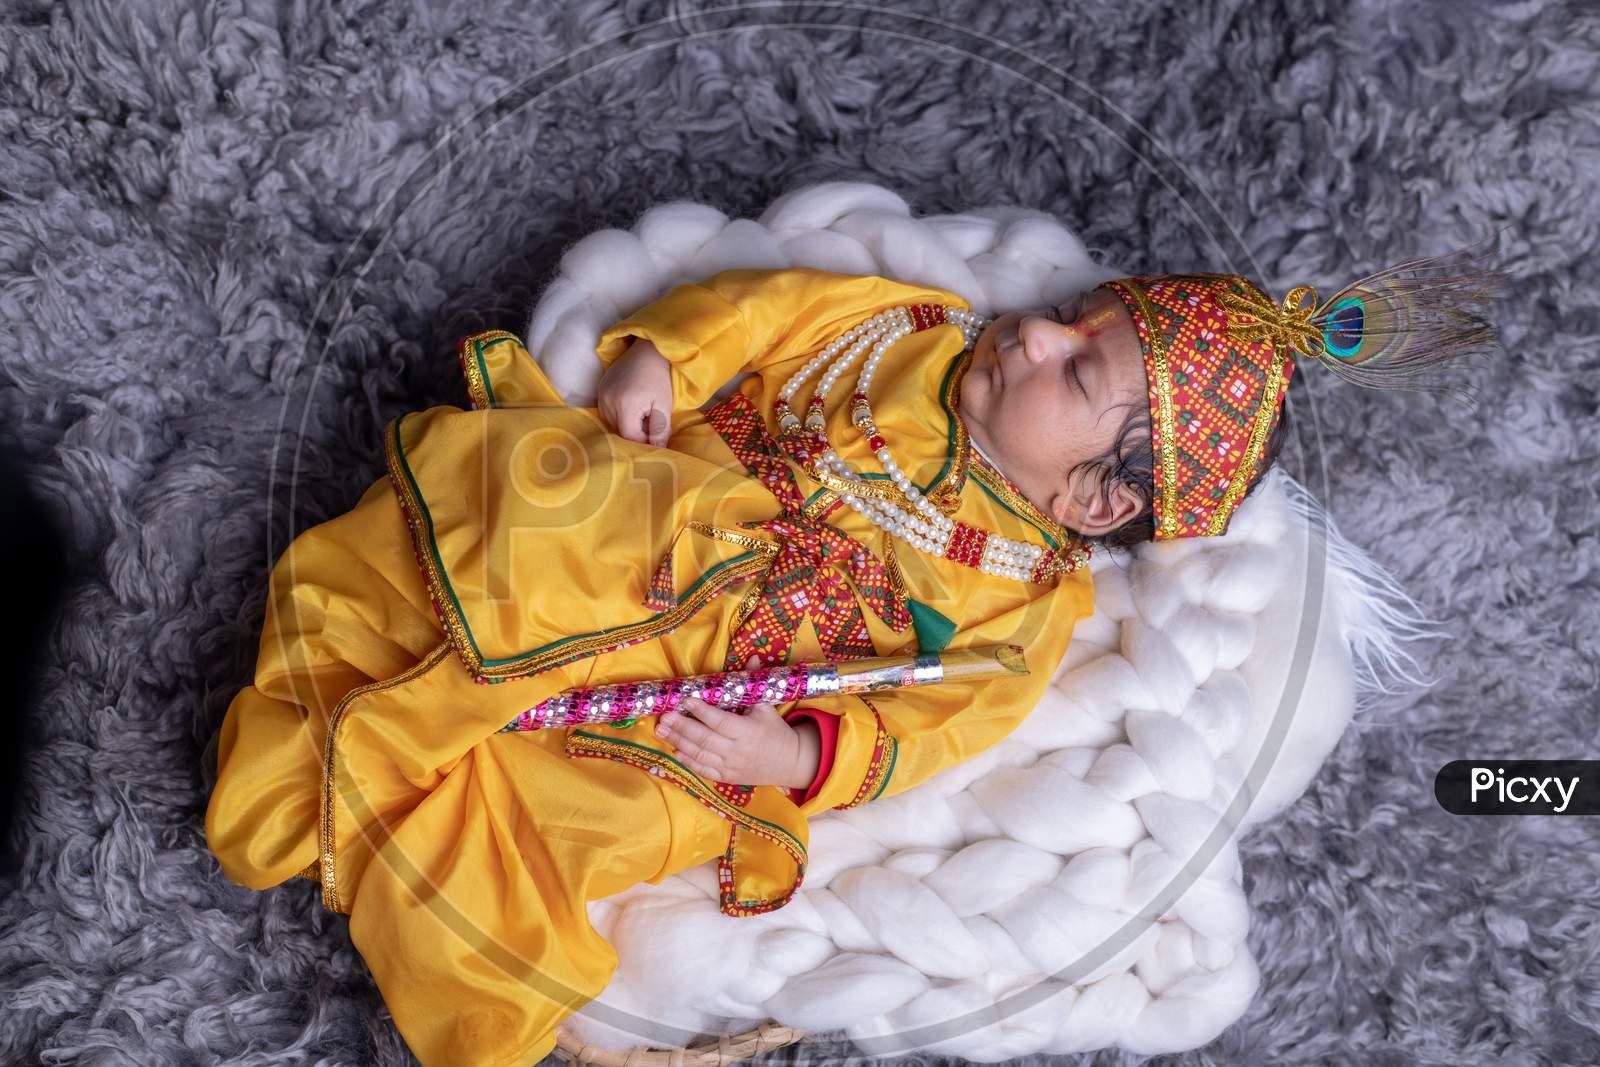 Cute Little Baby In Lord Sri Krishna Clothes  Sleeping Calmly